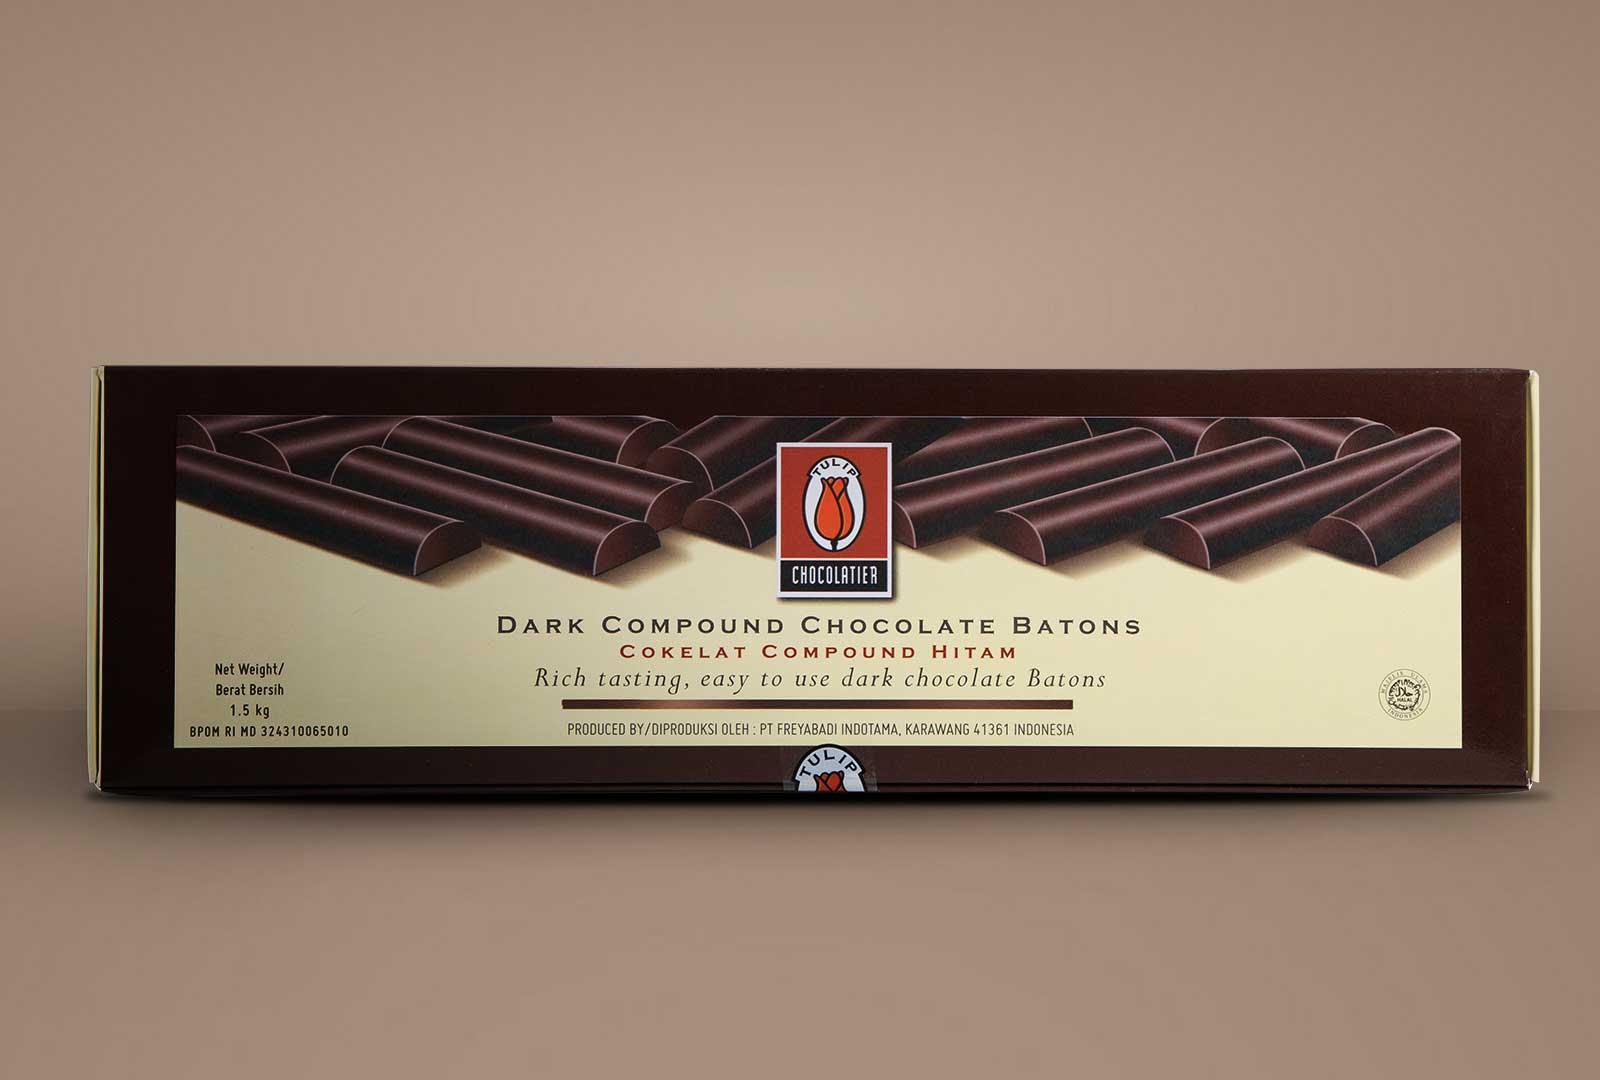 Dark-Compoun-Chocolate-BATONS-front-1